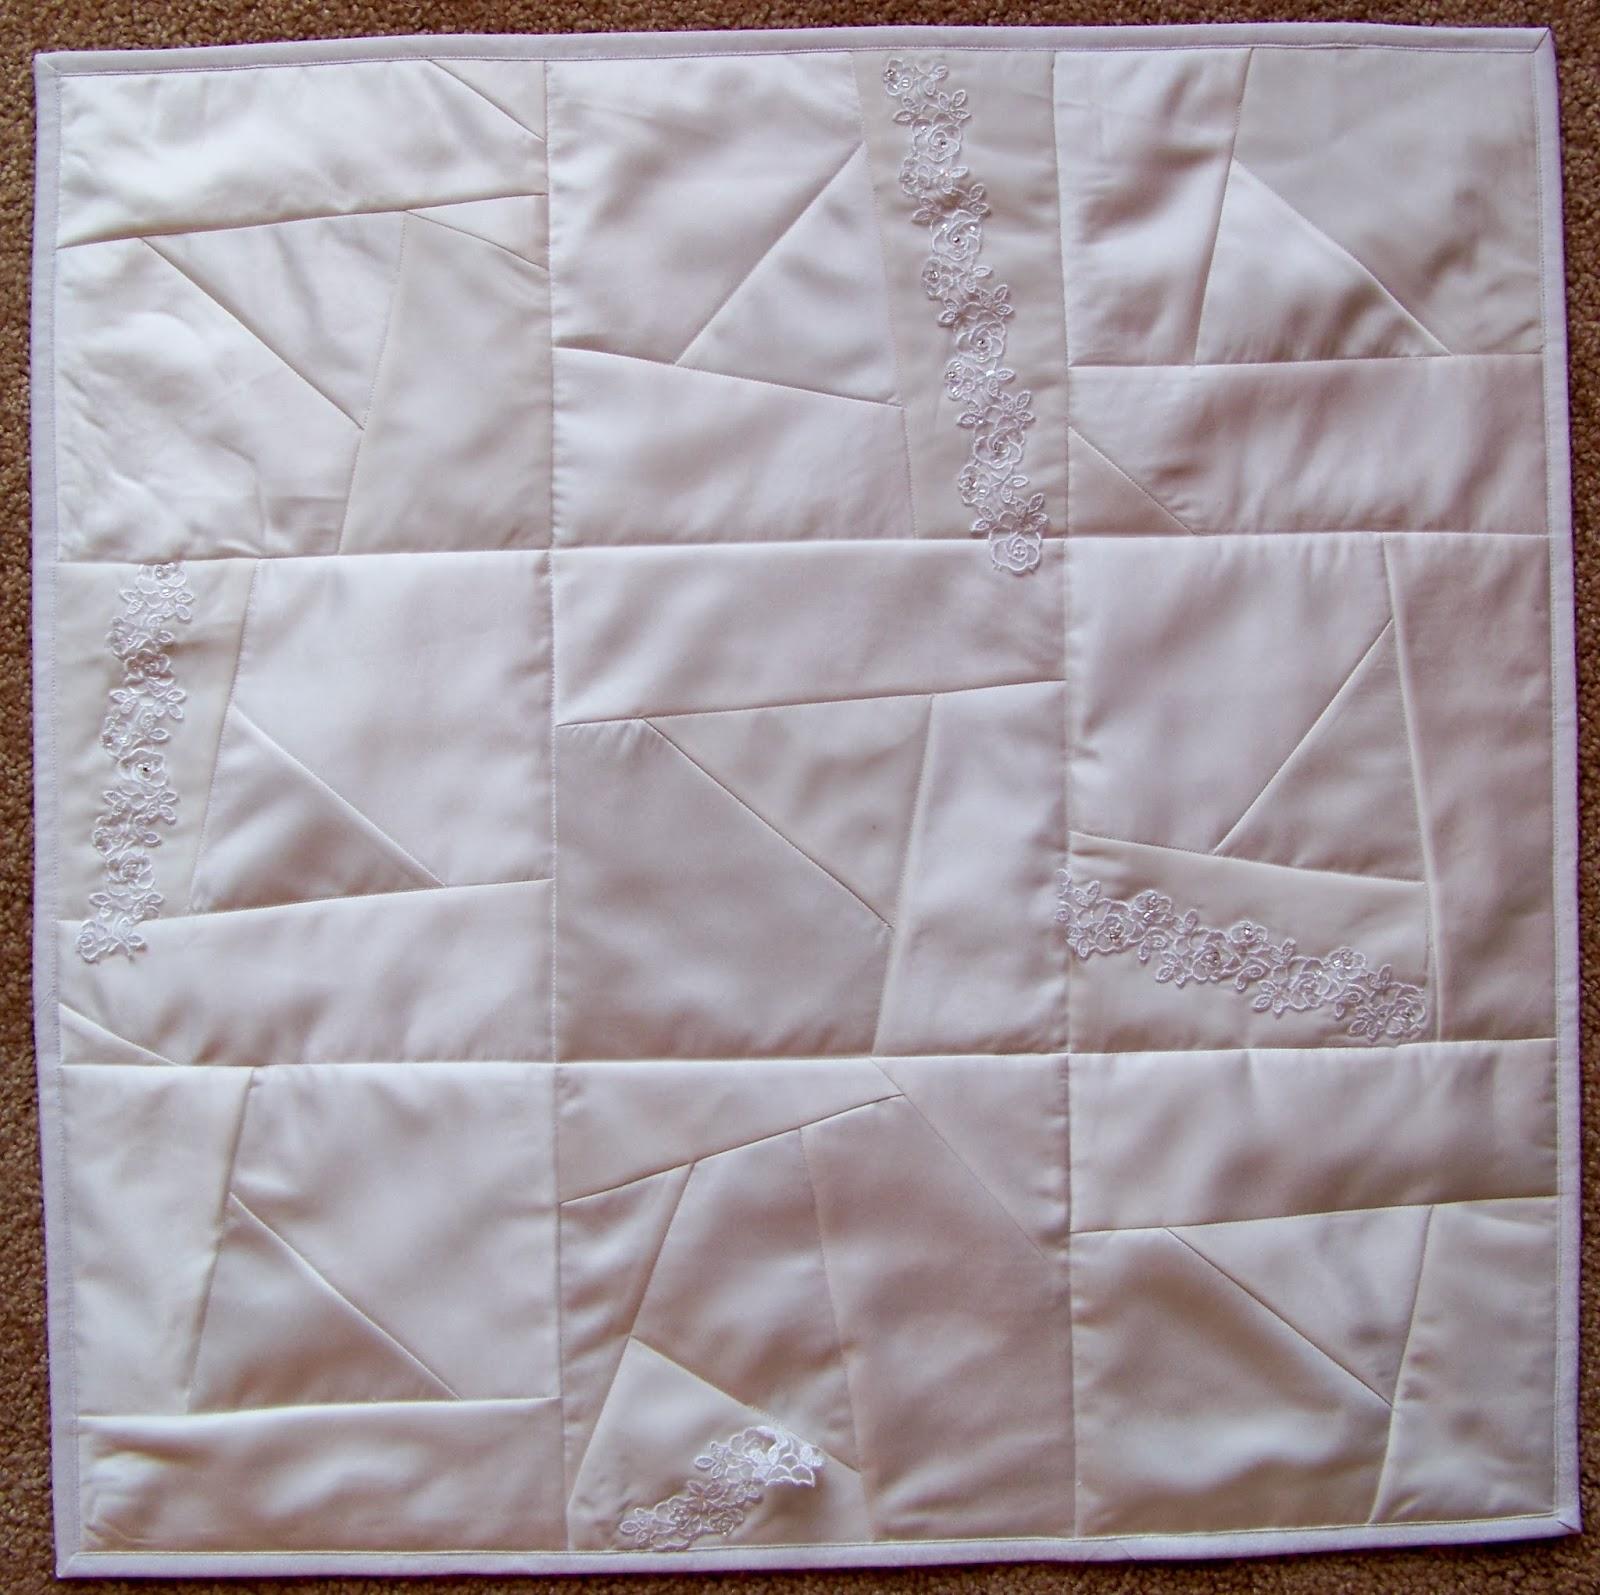 Wedding Dress Upcycled into Quilt | Debbie Lange Quilting : wedding dress quilts - Adamdwight.com